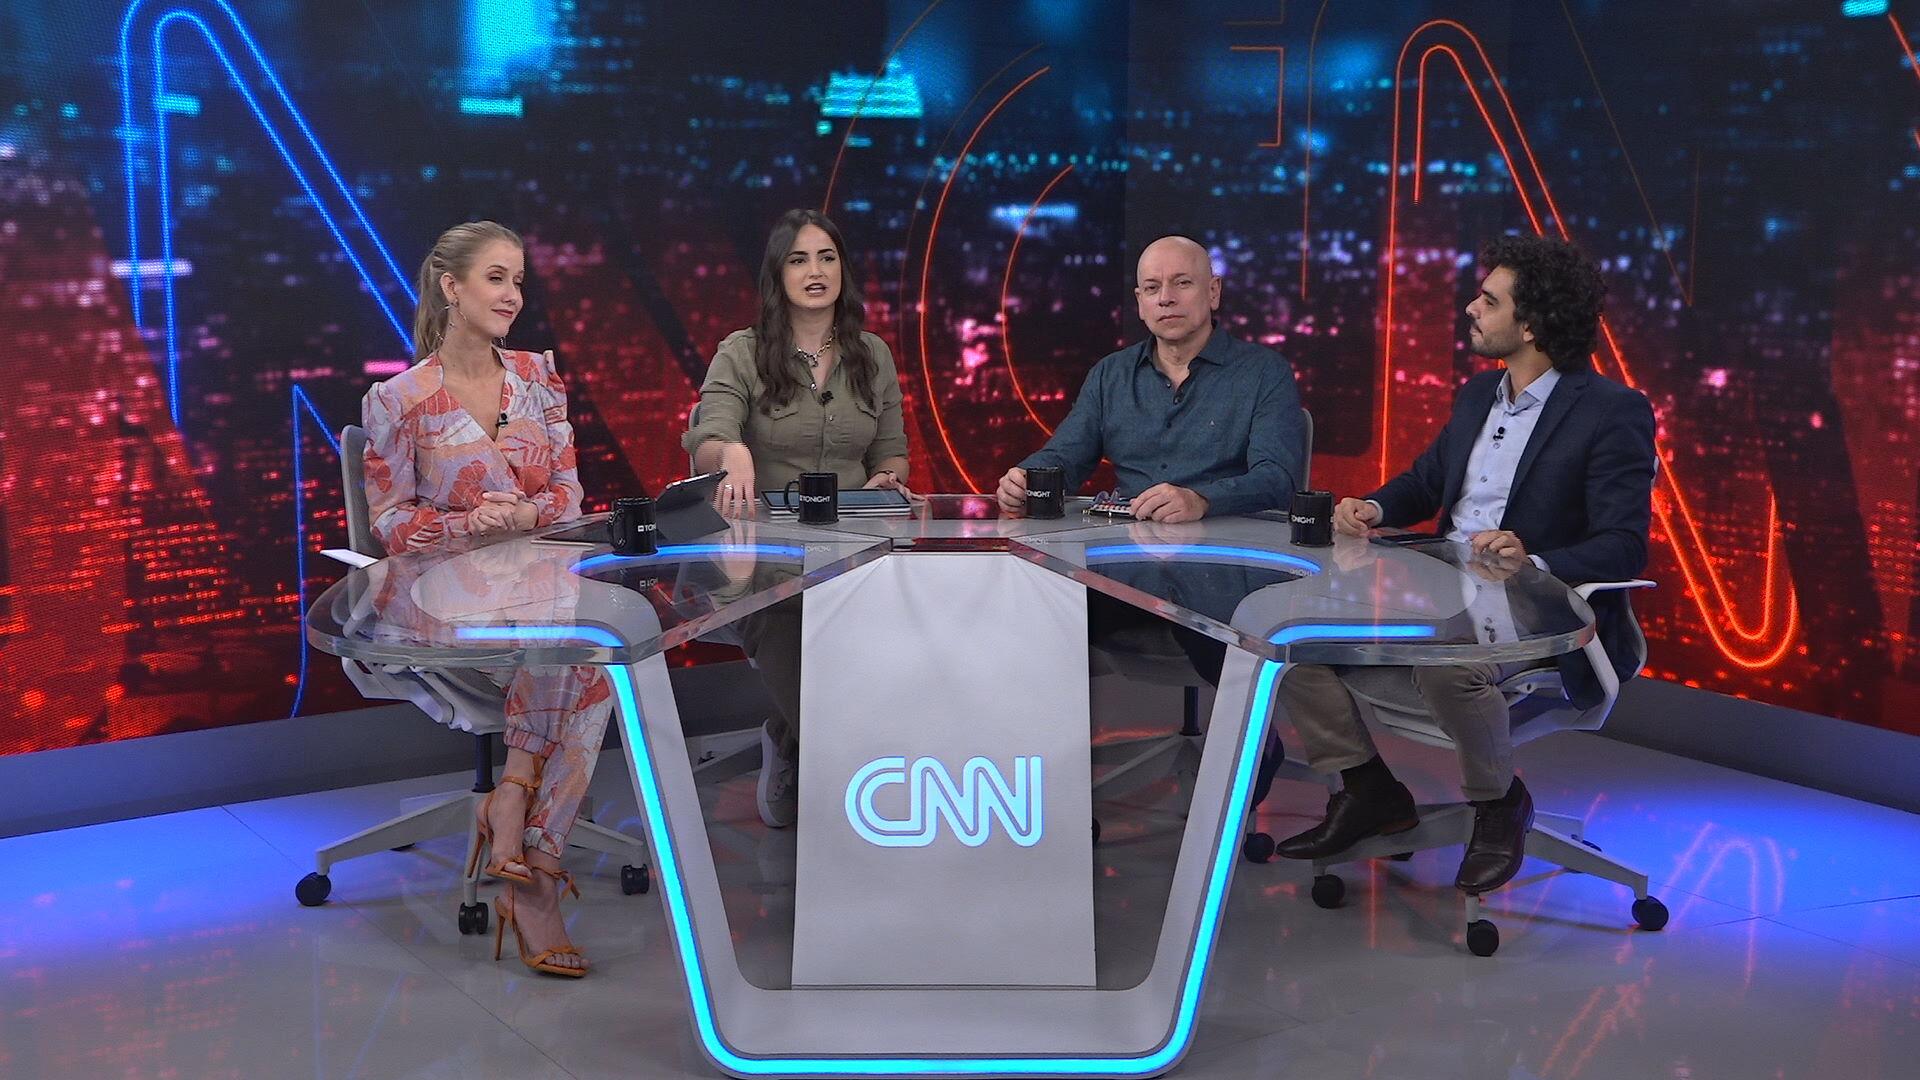 CNN Tonight, talk show apresentado por Mari Palma, Gabriela Prioli e Leandro Kar